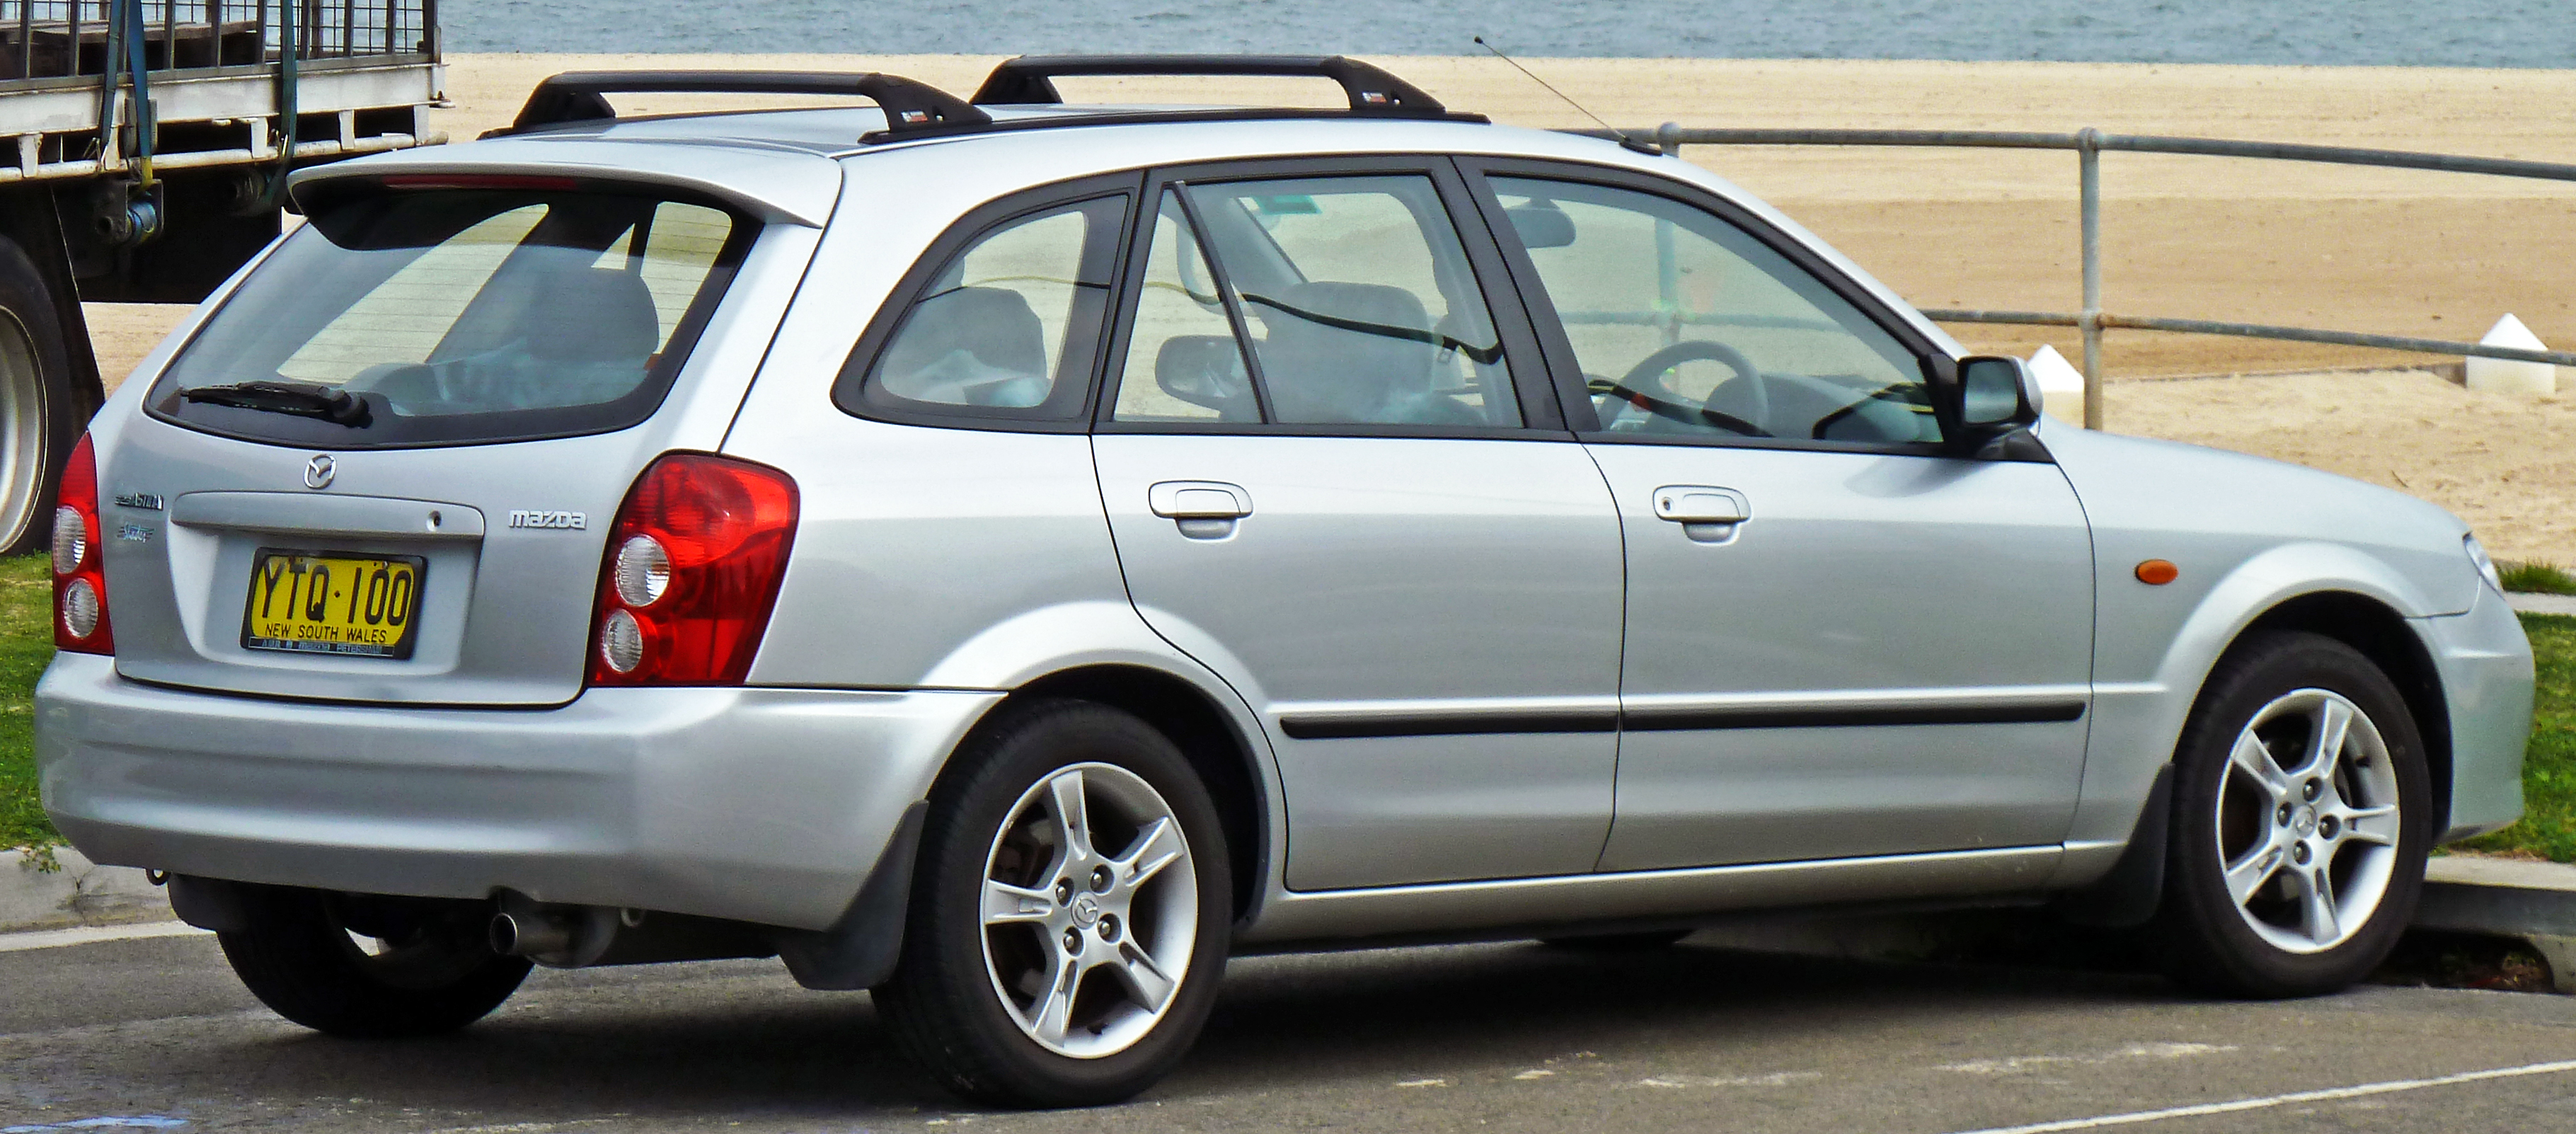 file 2003 mazda 323 bj ii astina shades 5 door hatchback 03 jpg rh commons wikimedia org 97 Mazda 98 Mazda